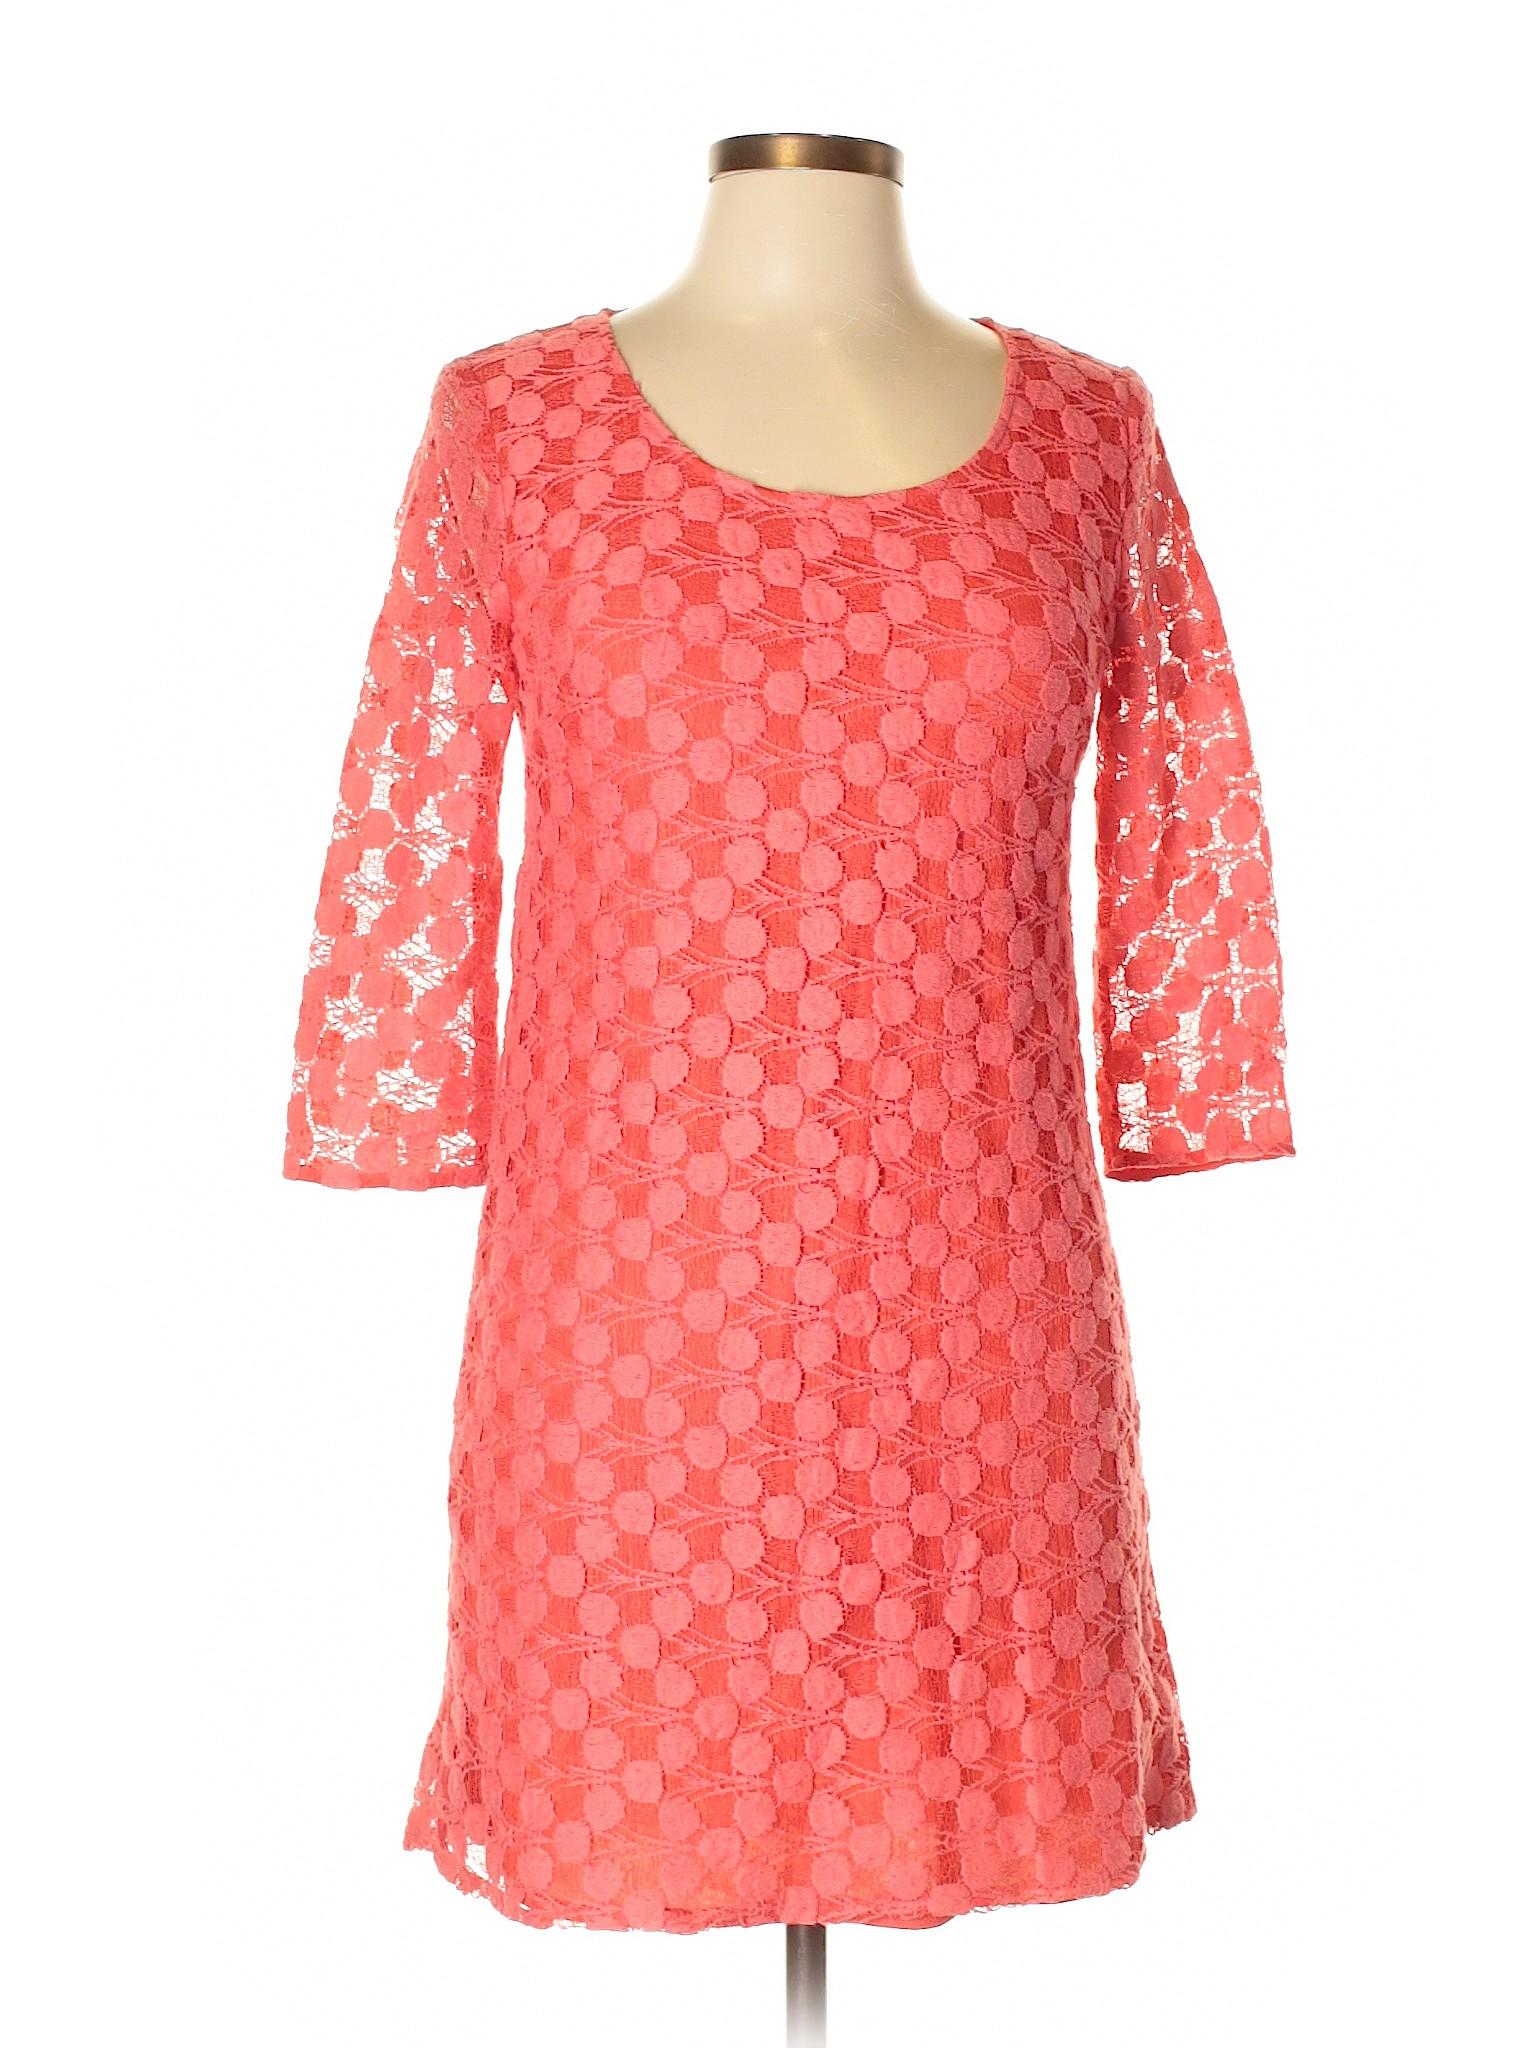 Emmelee Selling Casual Selling Selling Casual Emmelee Dress Dress Emmelee qfxnxHwaRp